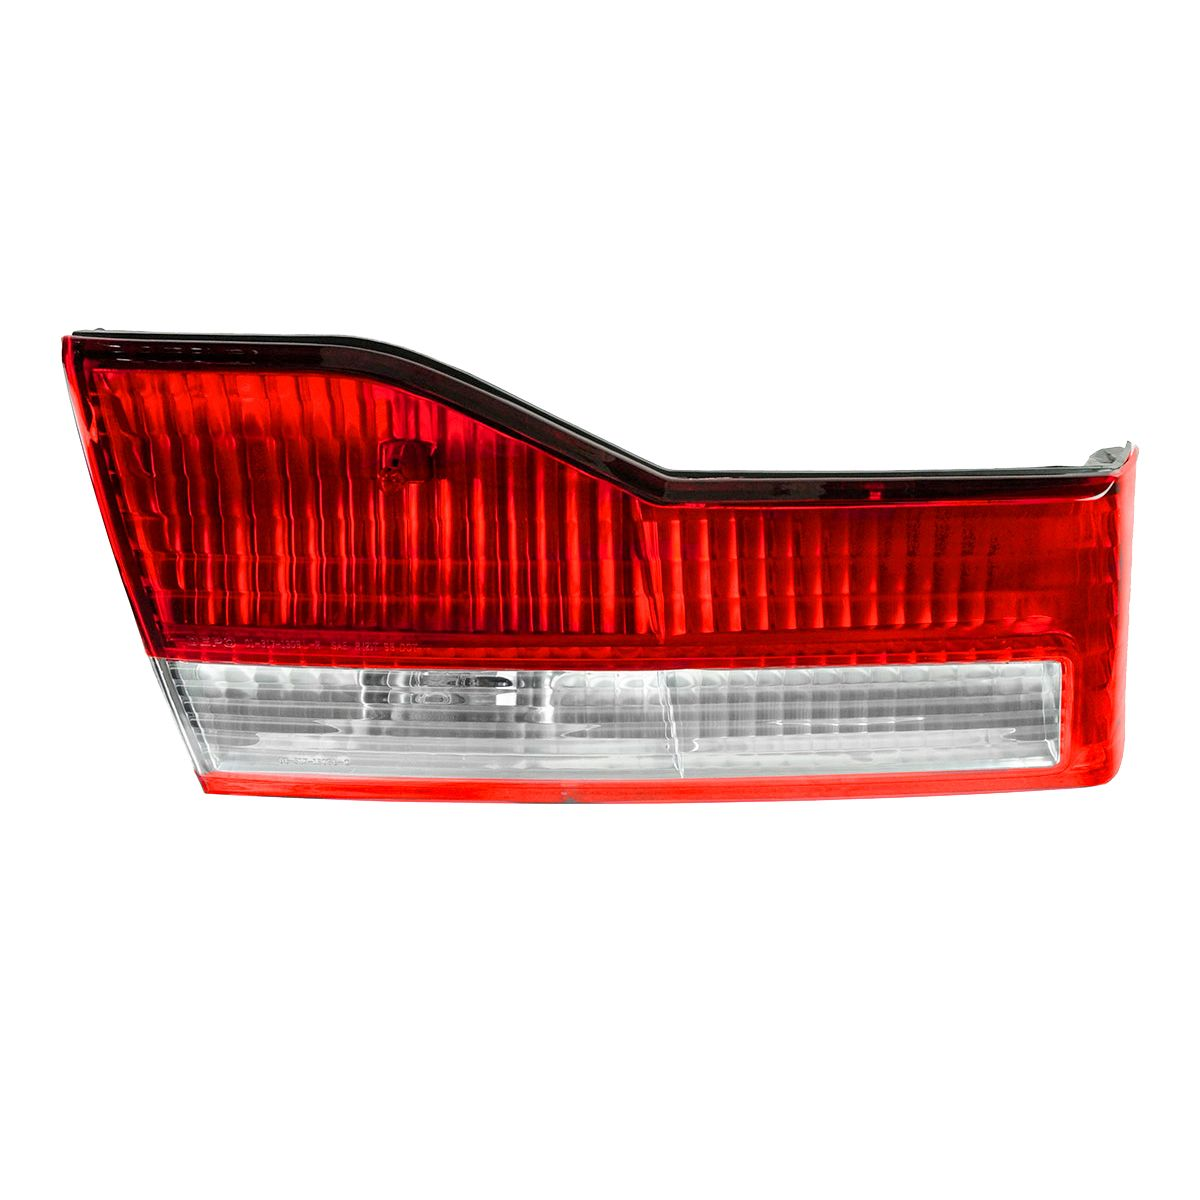 01-02 Accord Sedan Taillight Taillamp Rear Brake Light Lamp Right Passenger Side